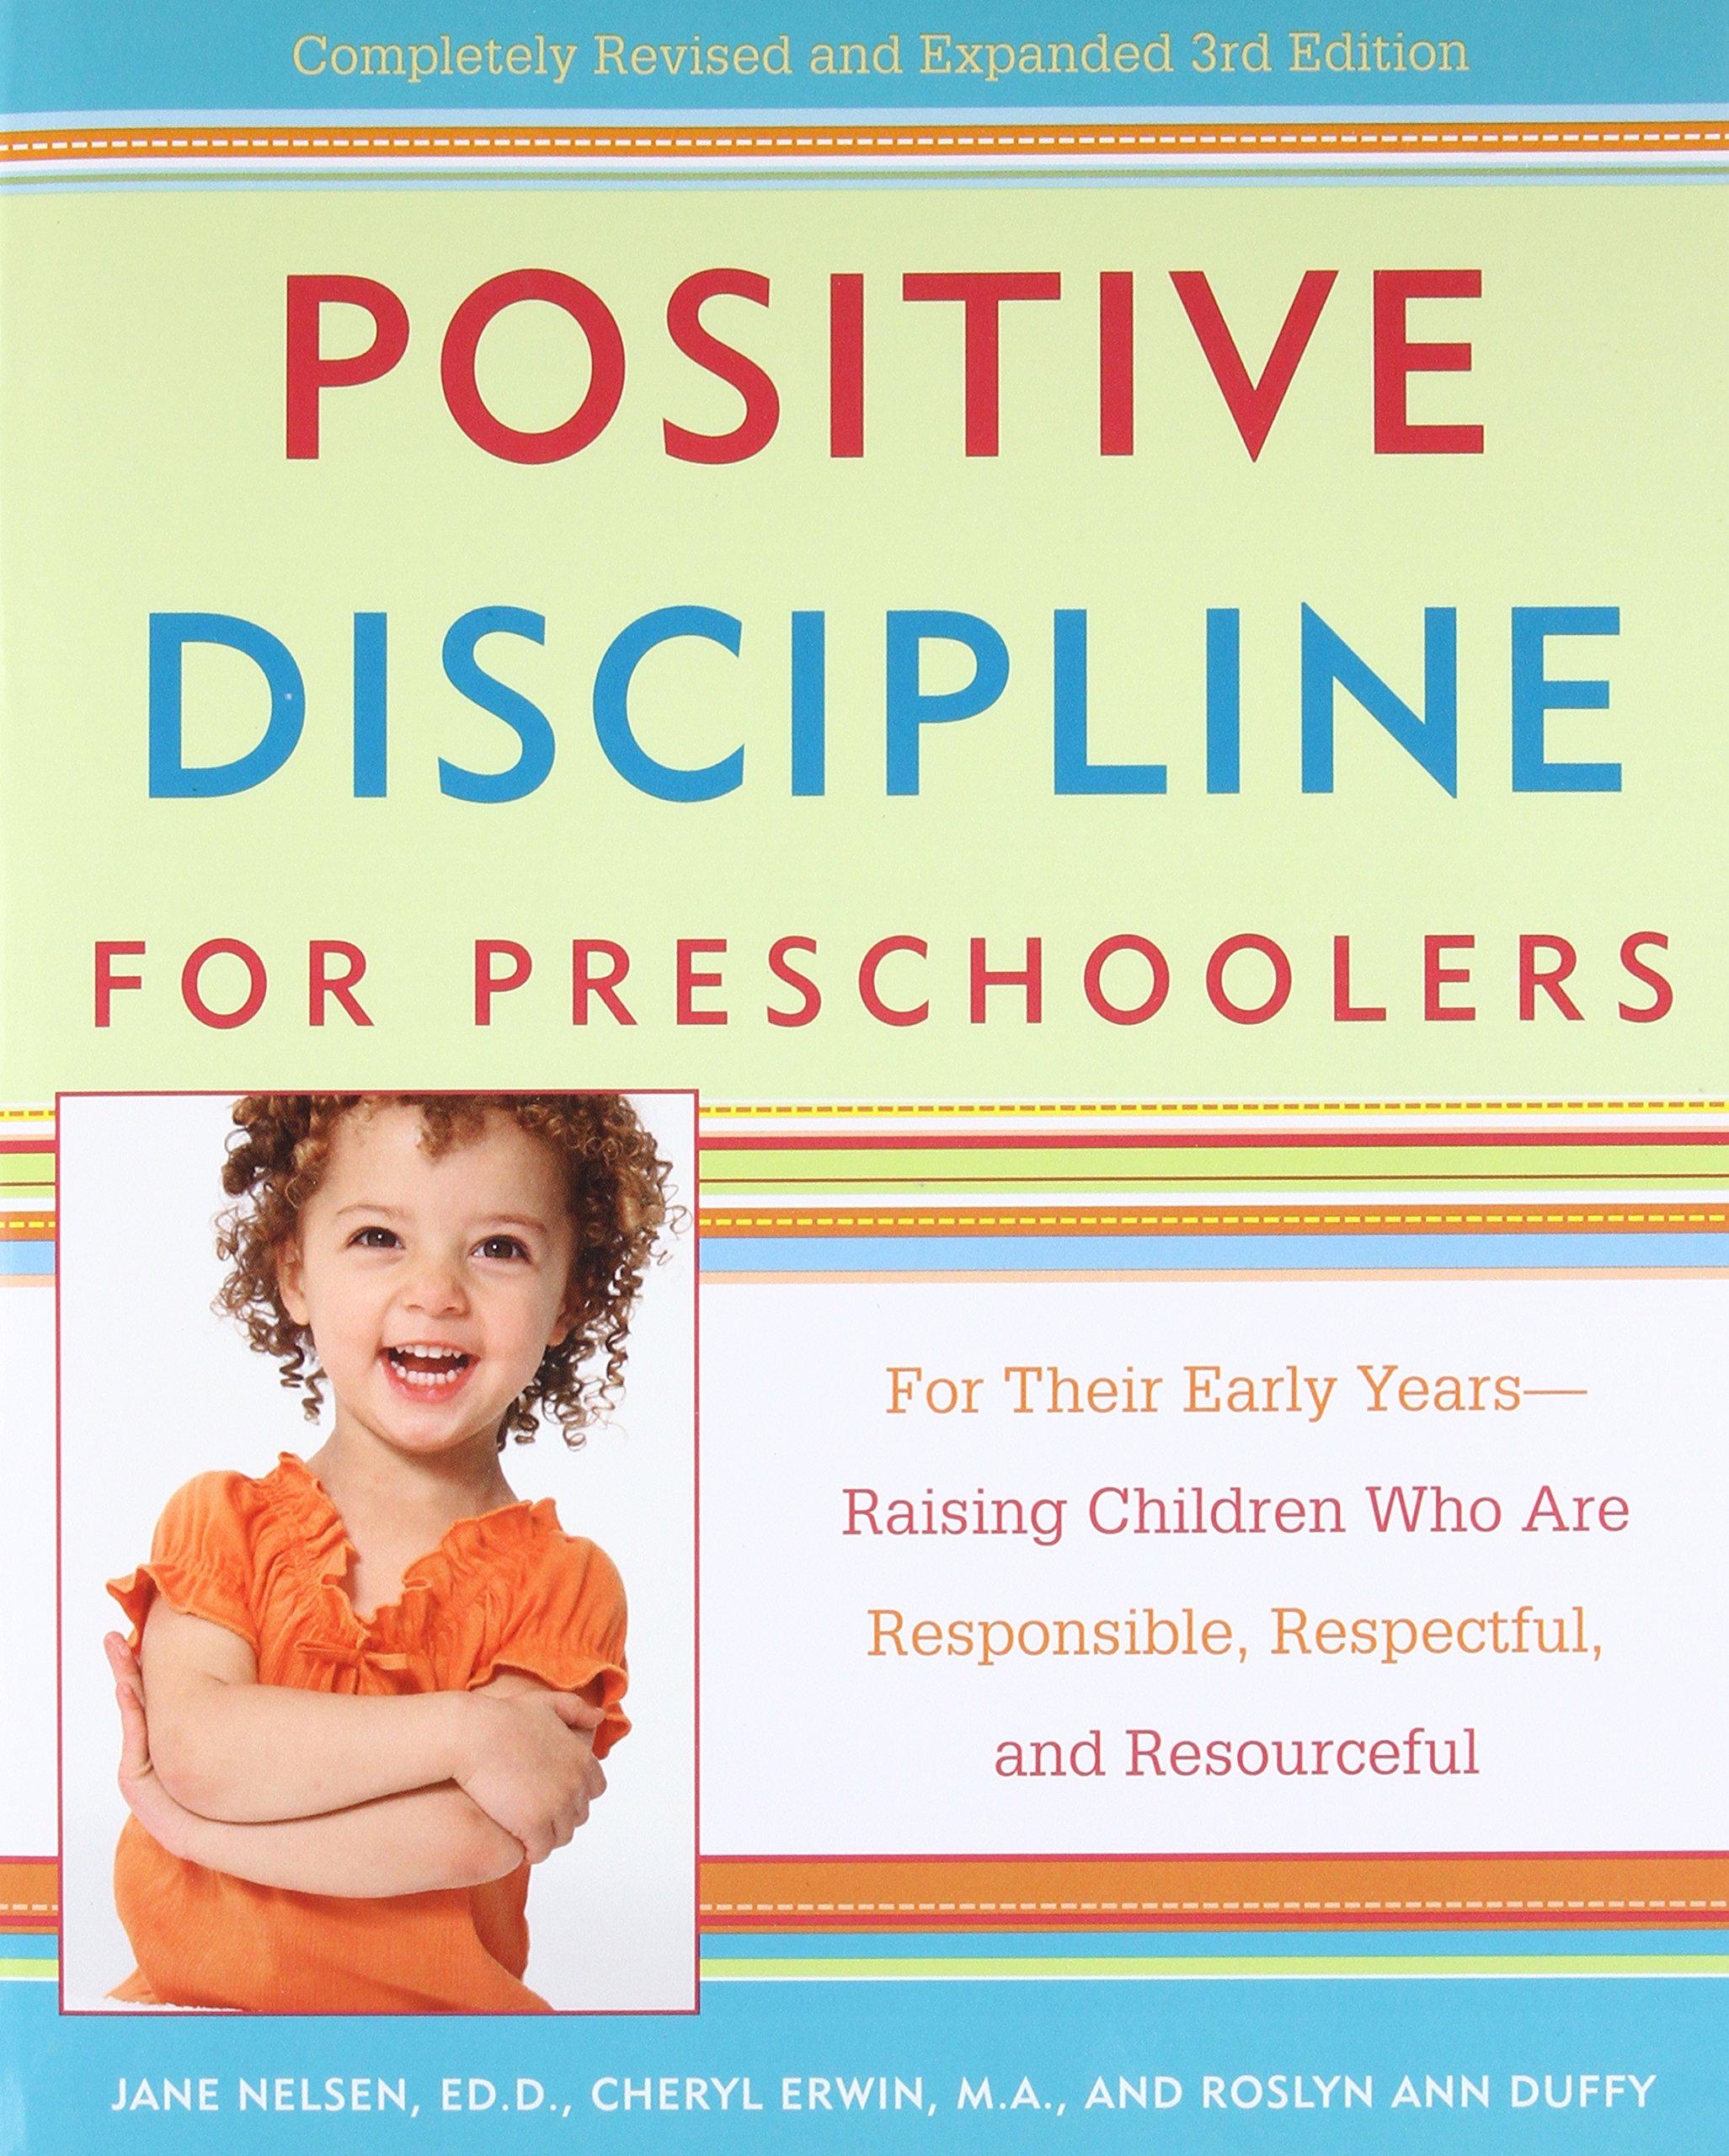 Positive Discipline Preschoolers Years Raising Responsible product image